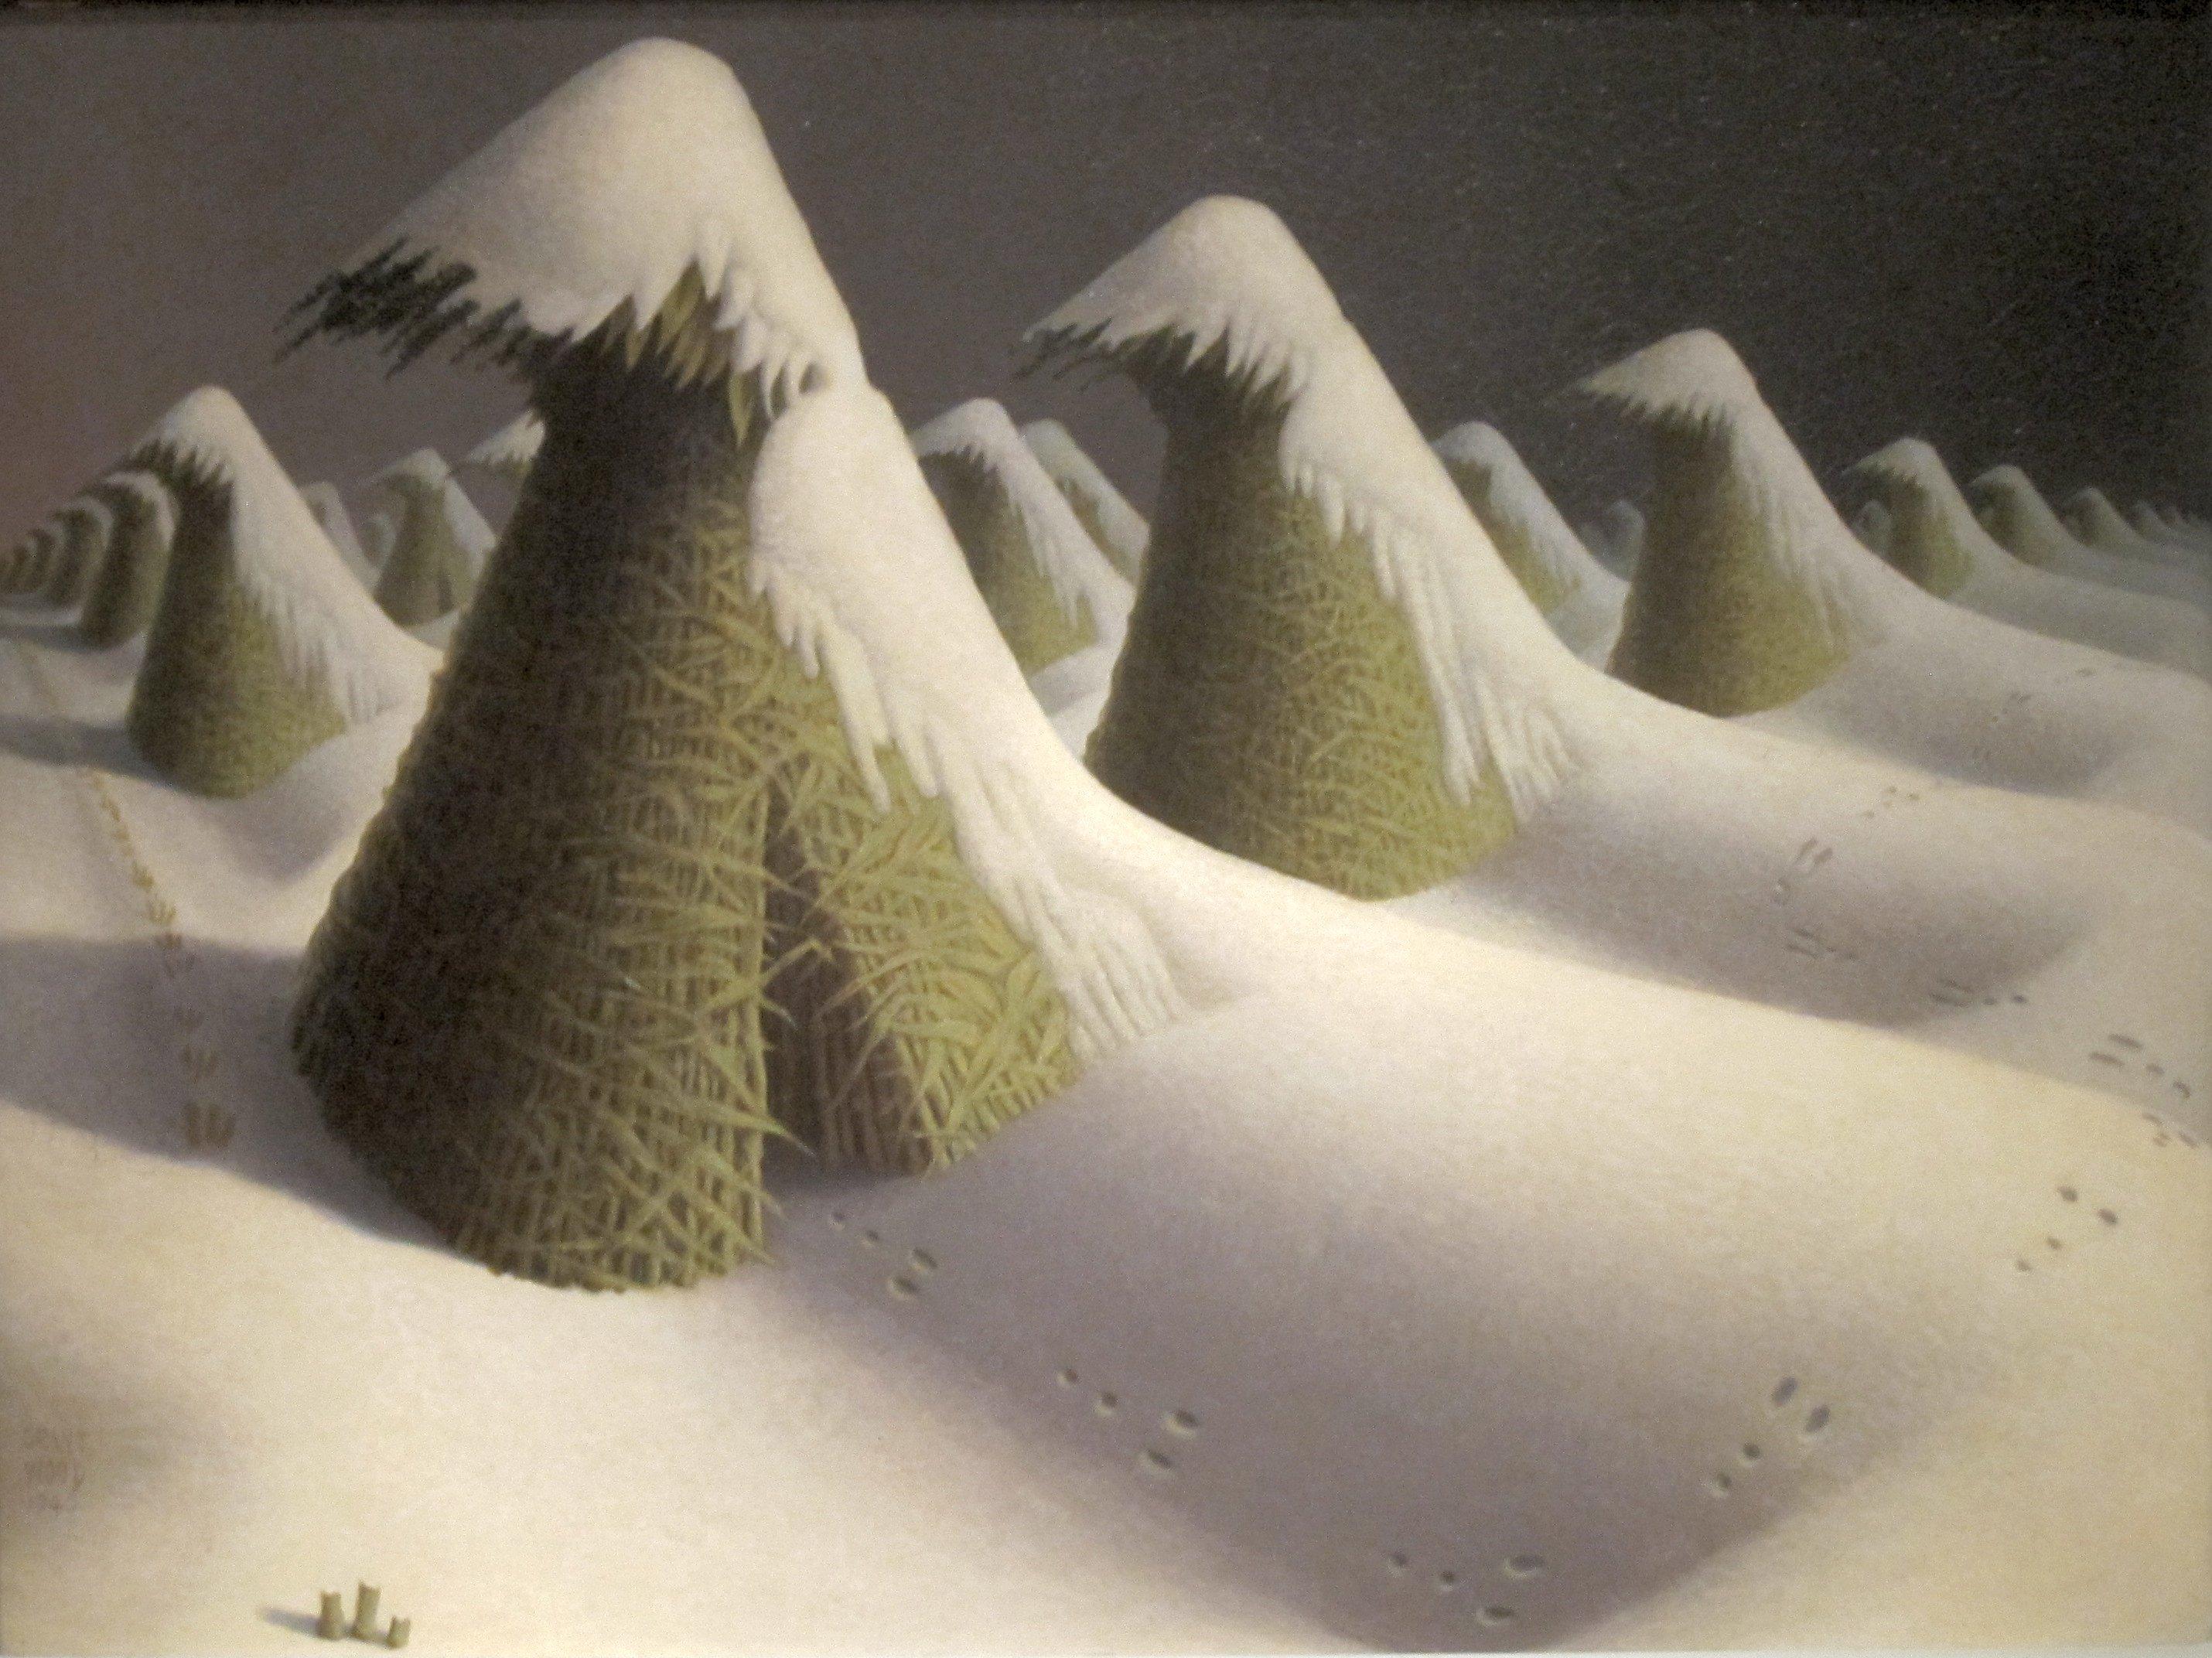 Grant Wood: An American artist